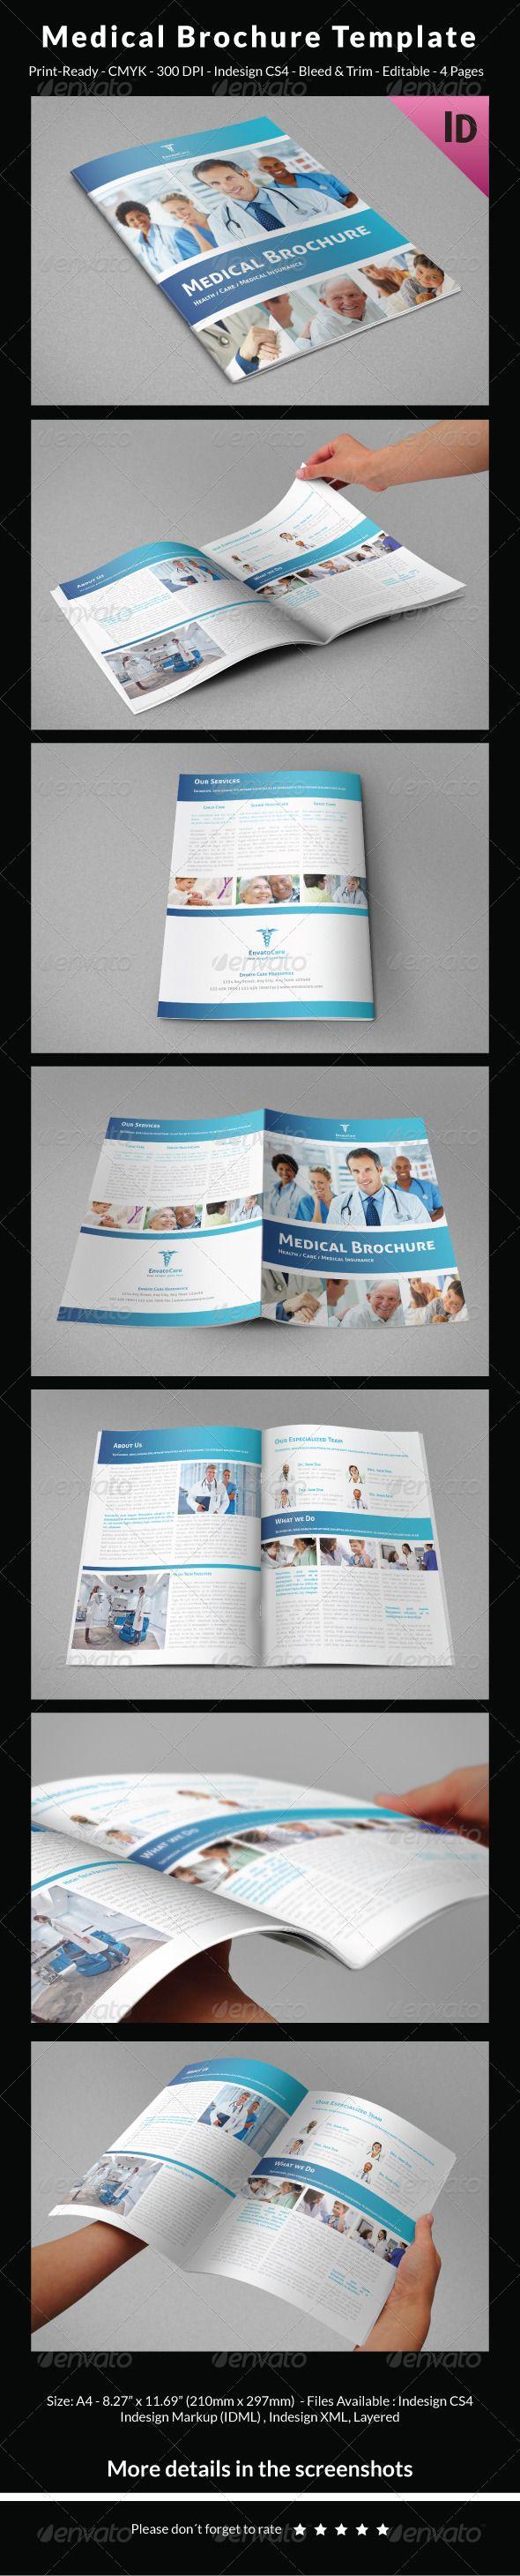 Medical Brochure Template   Libros